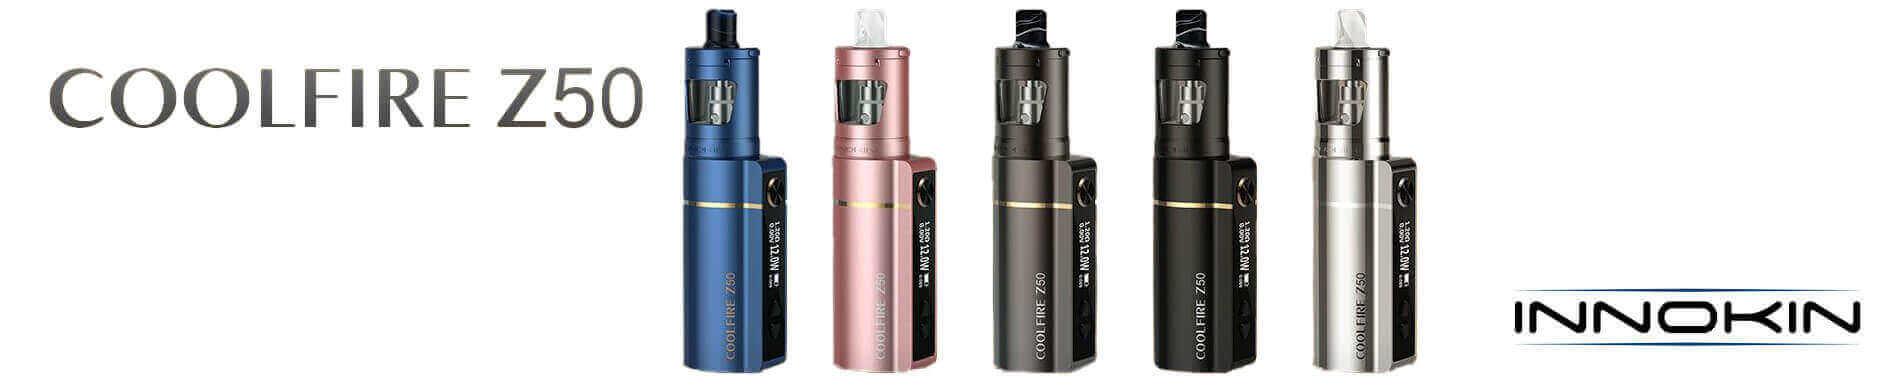 Kit CoolFire Z50 par Innokin